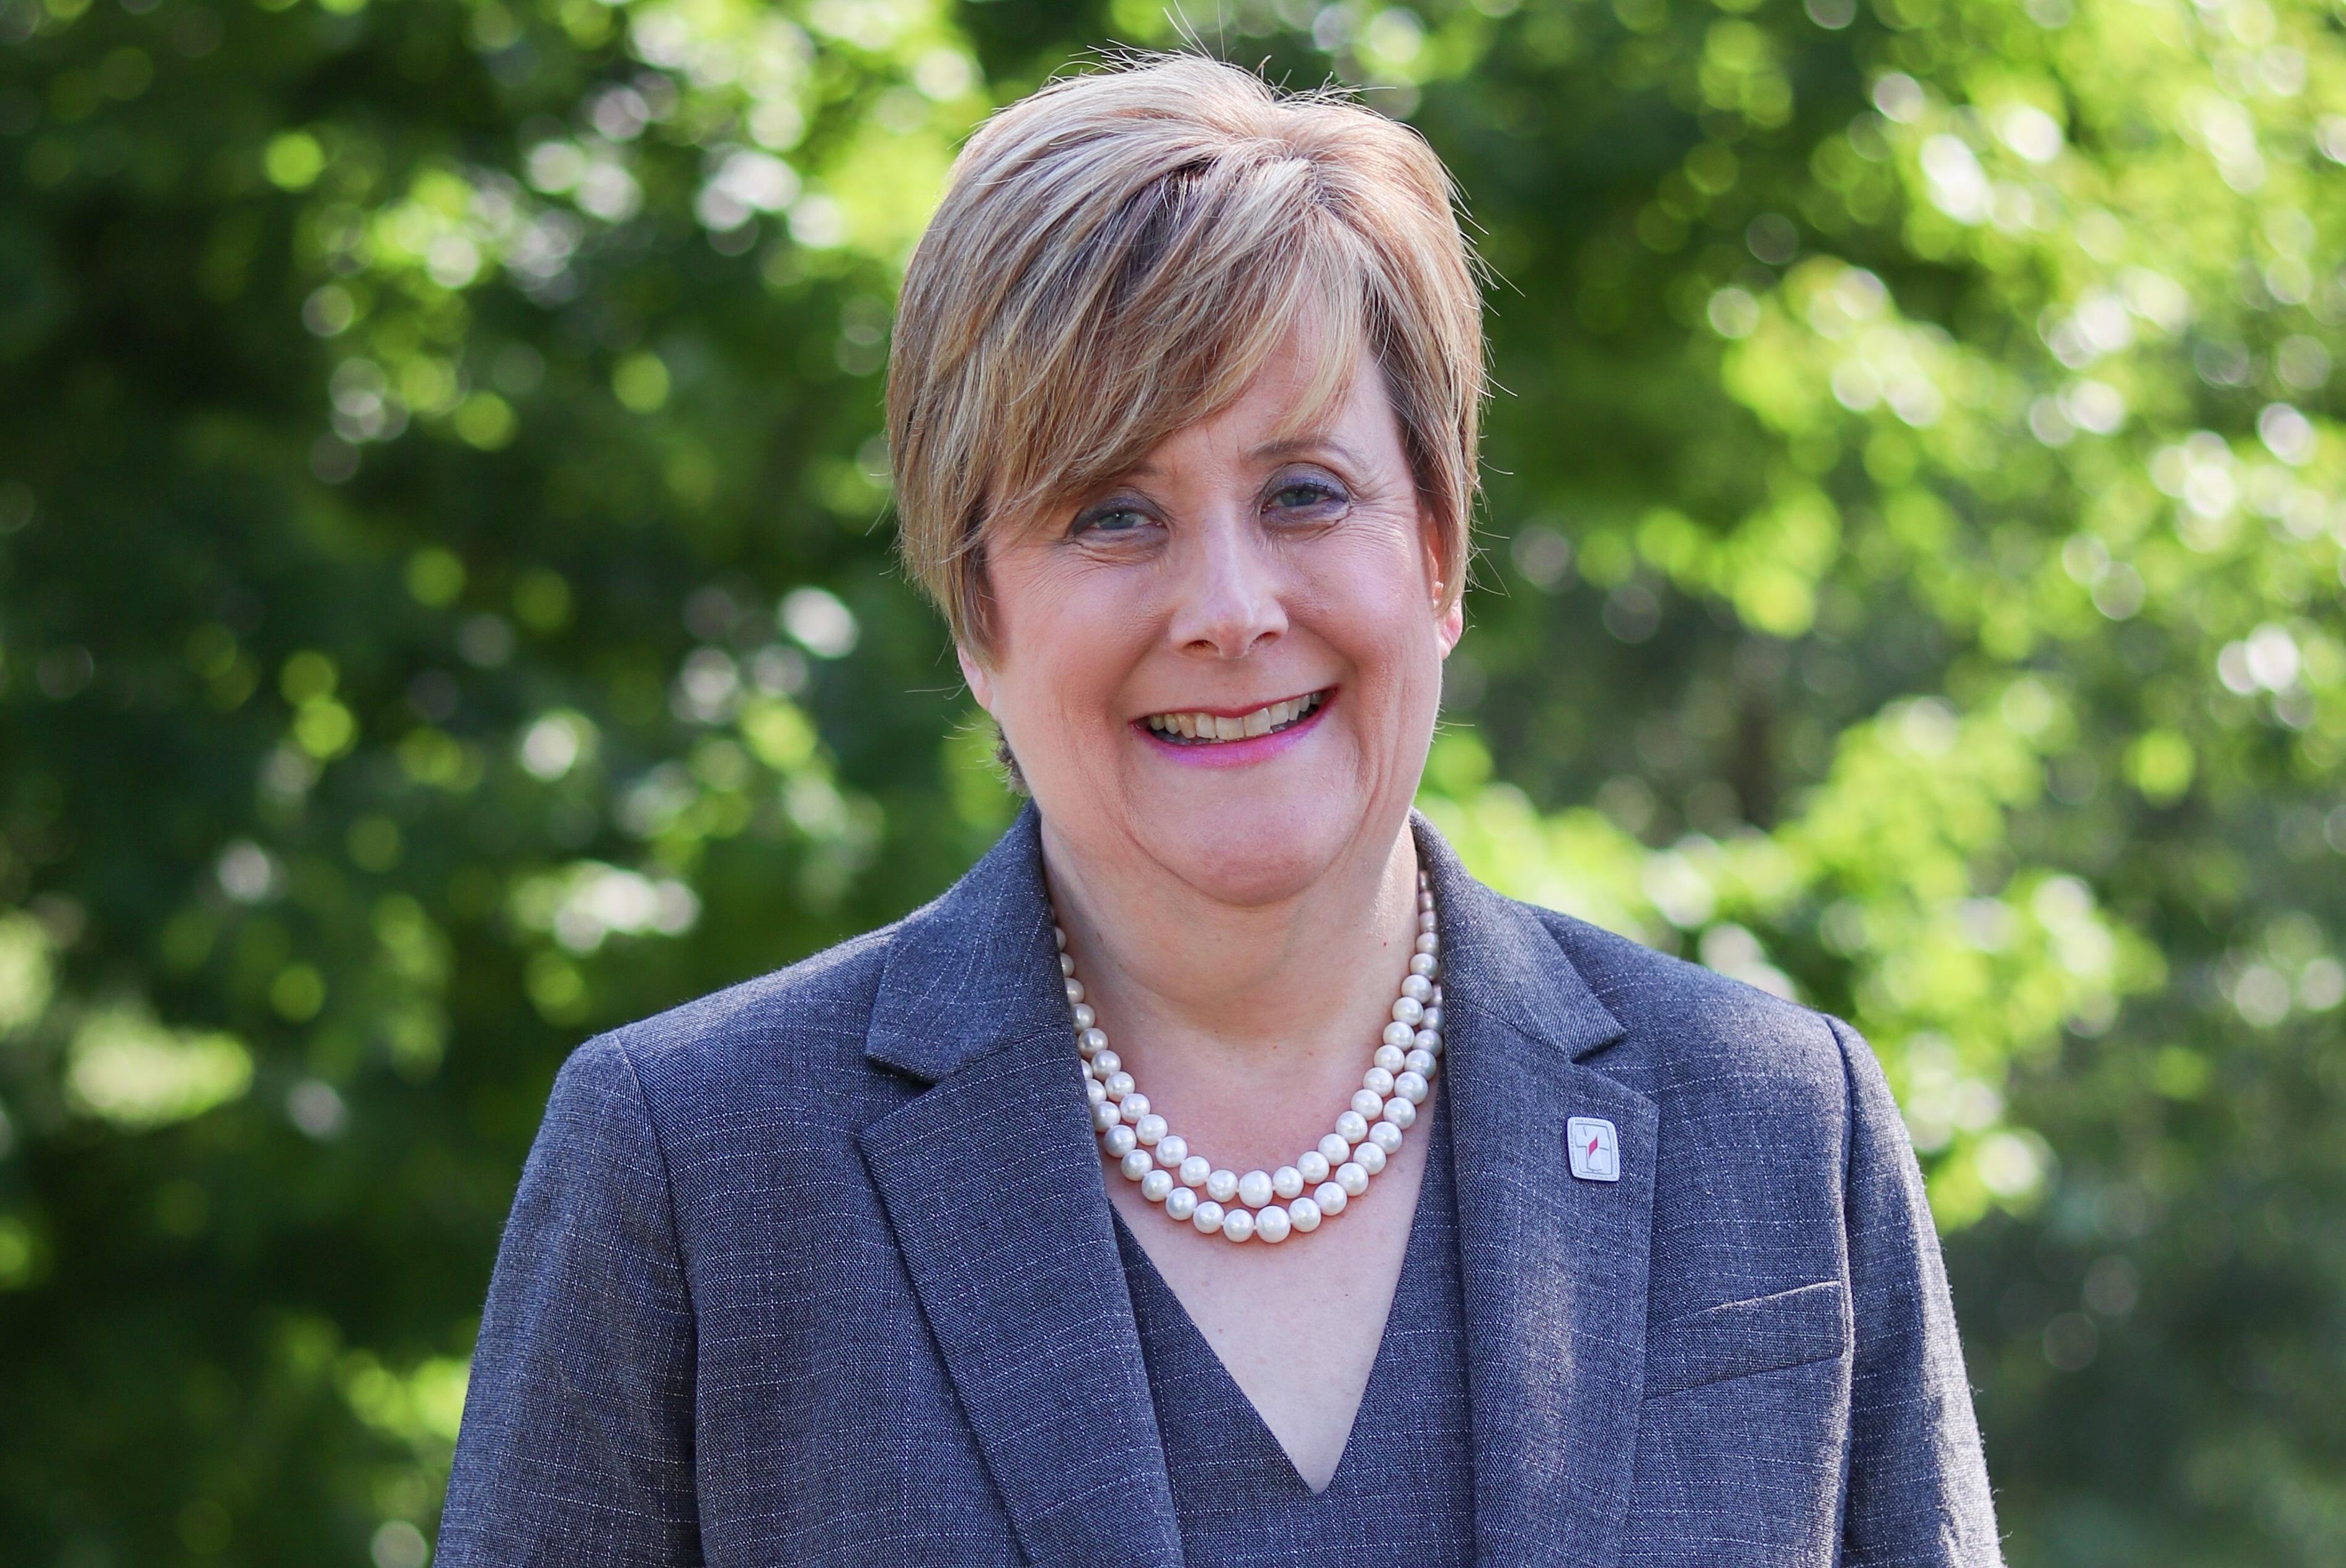 Rev. Julie Hager Love, President/CEO